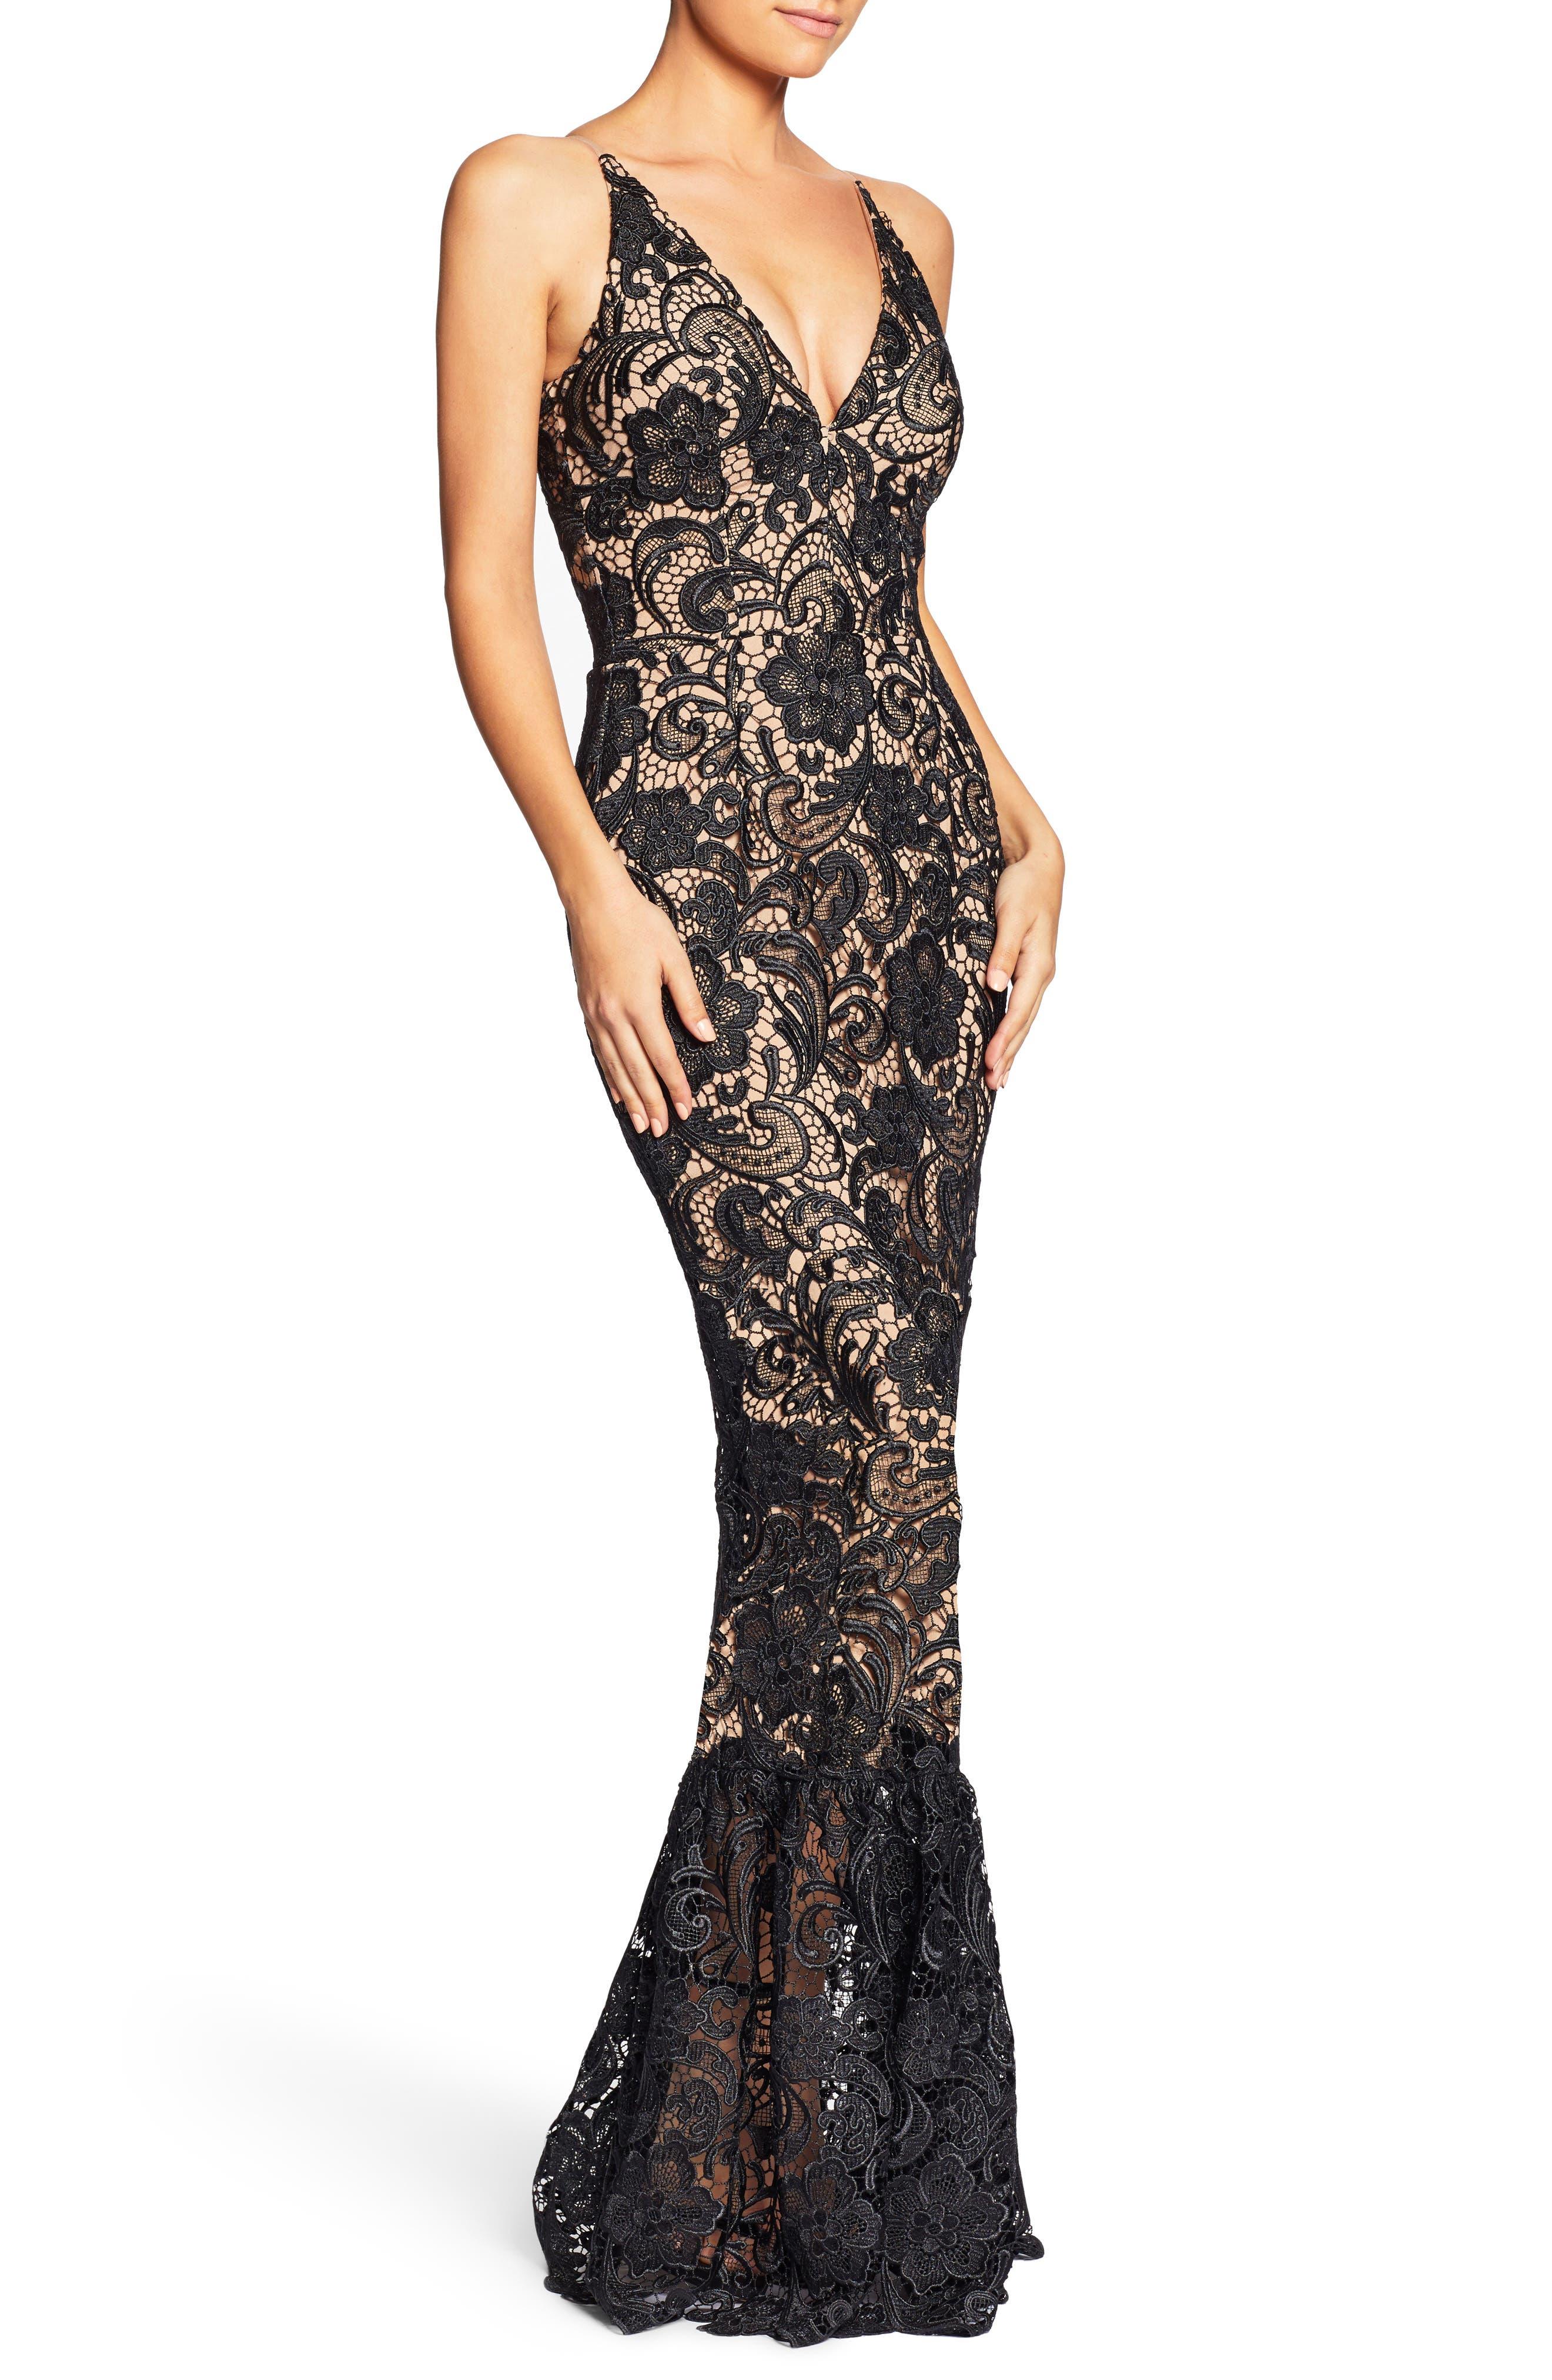 Sophia Crochet Lace Mermaid Gown,                             Alternate thumbnail 3, color,                             014